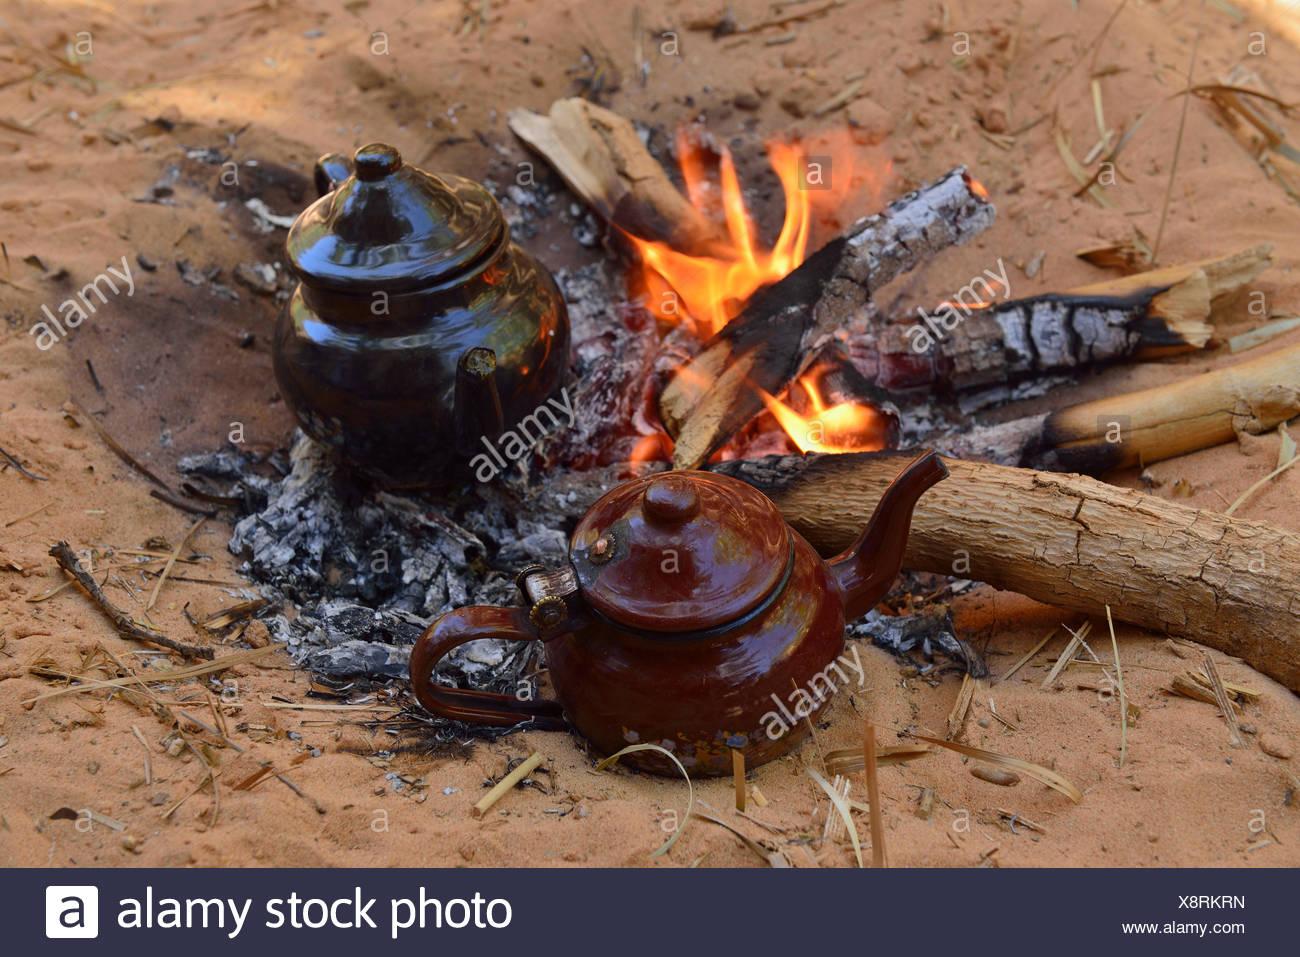 Tuareg, Touareg tea pot on a fire, Algeria, Sahara desert, North Africa - Stock Image